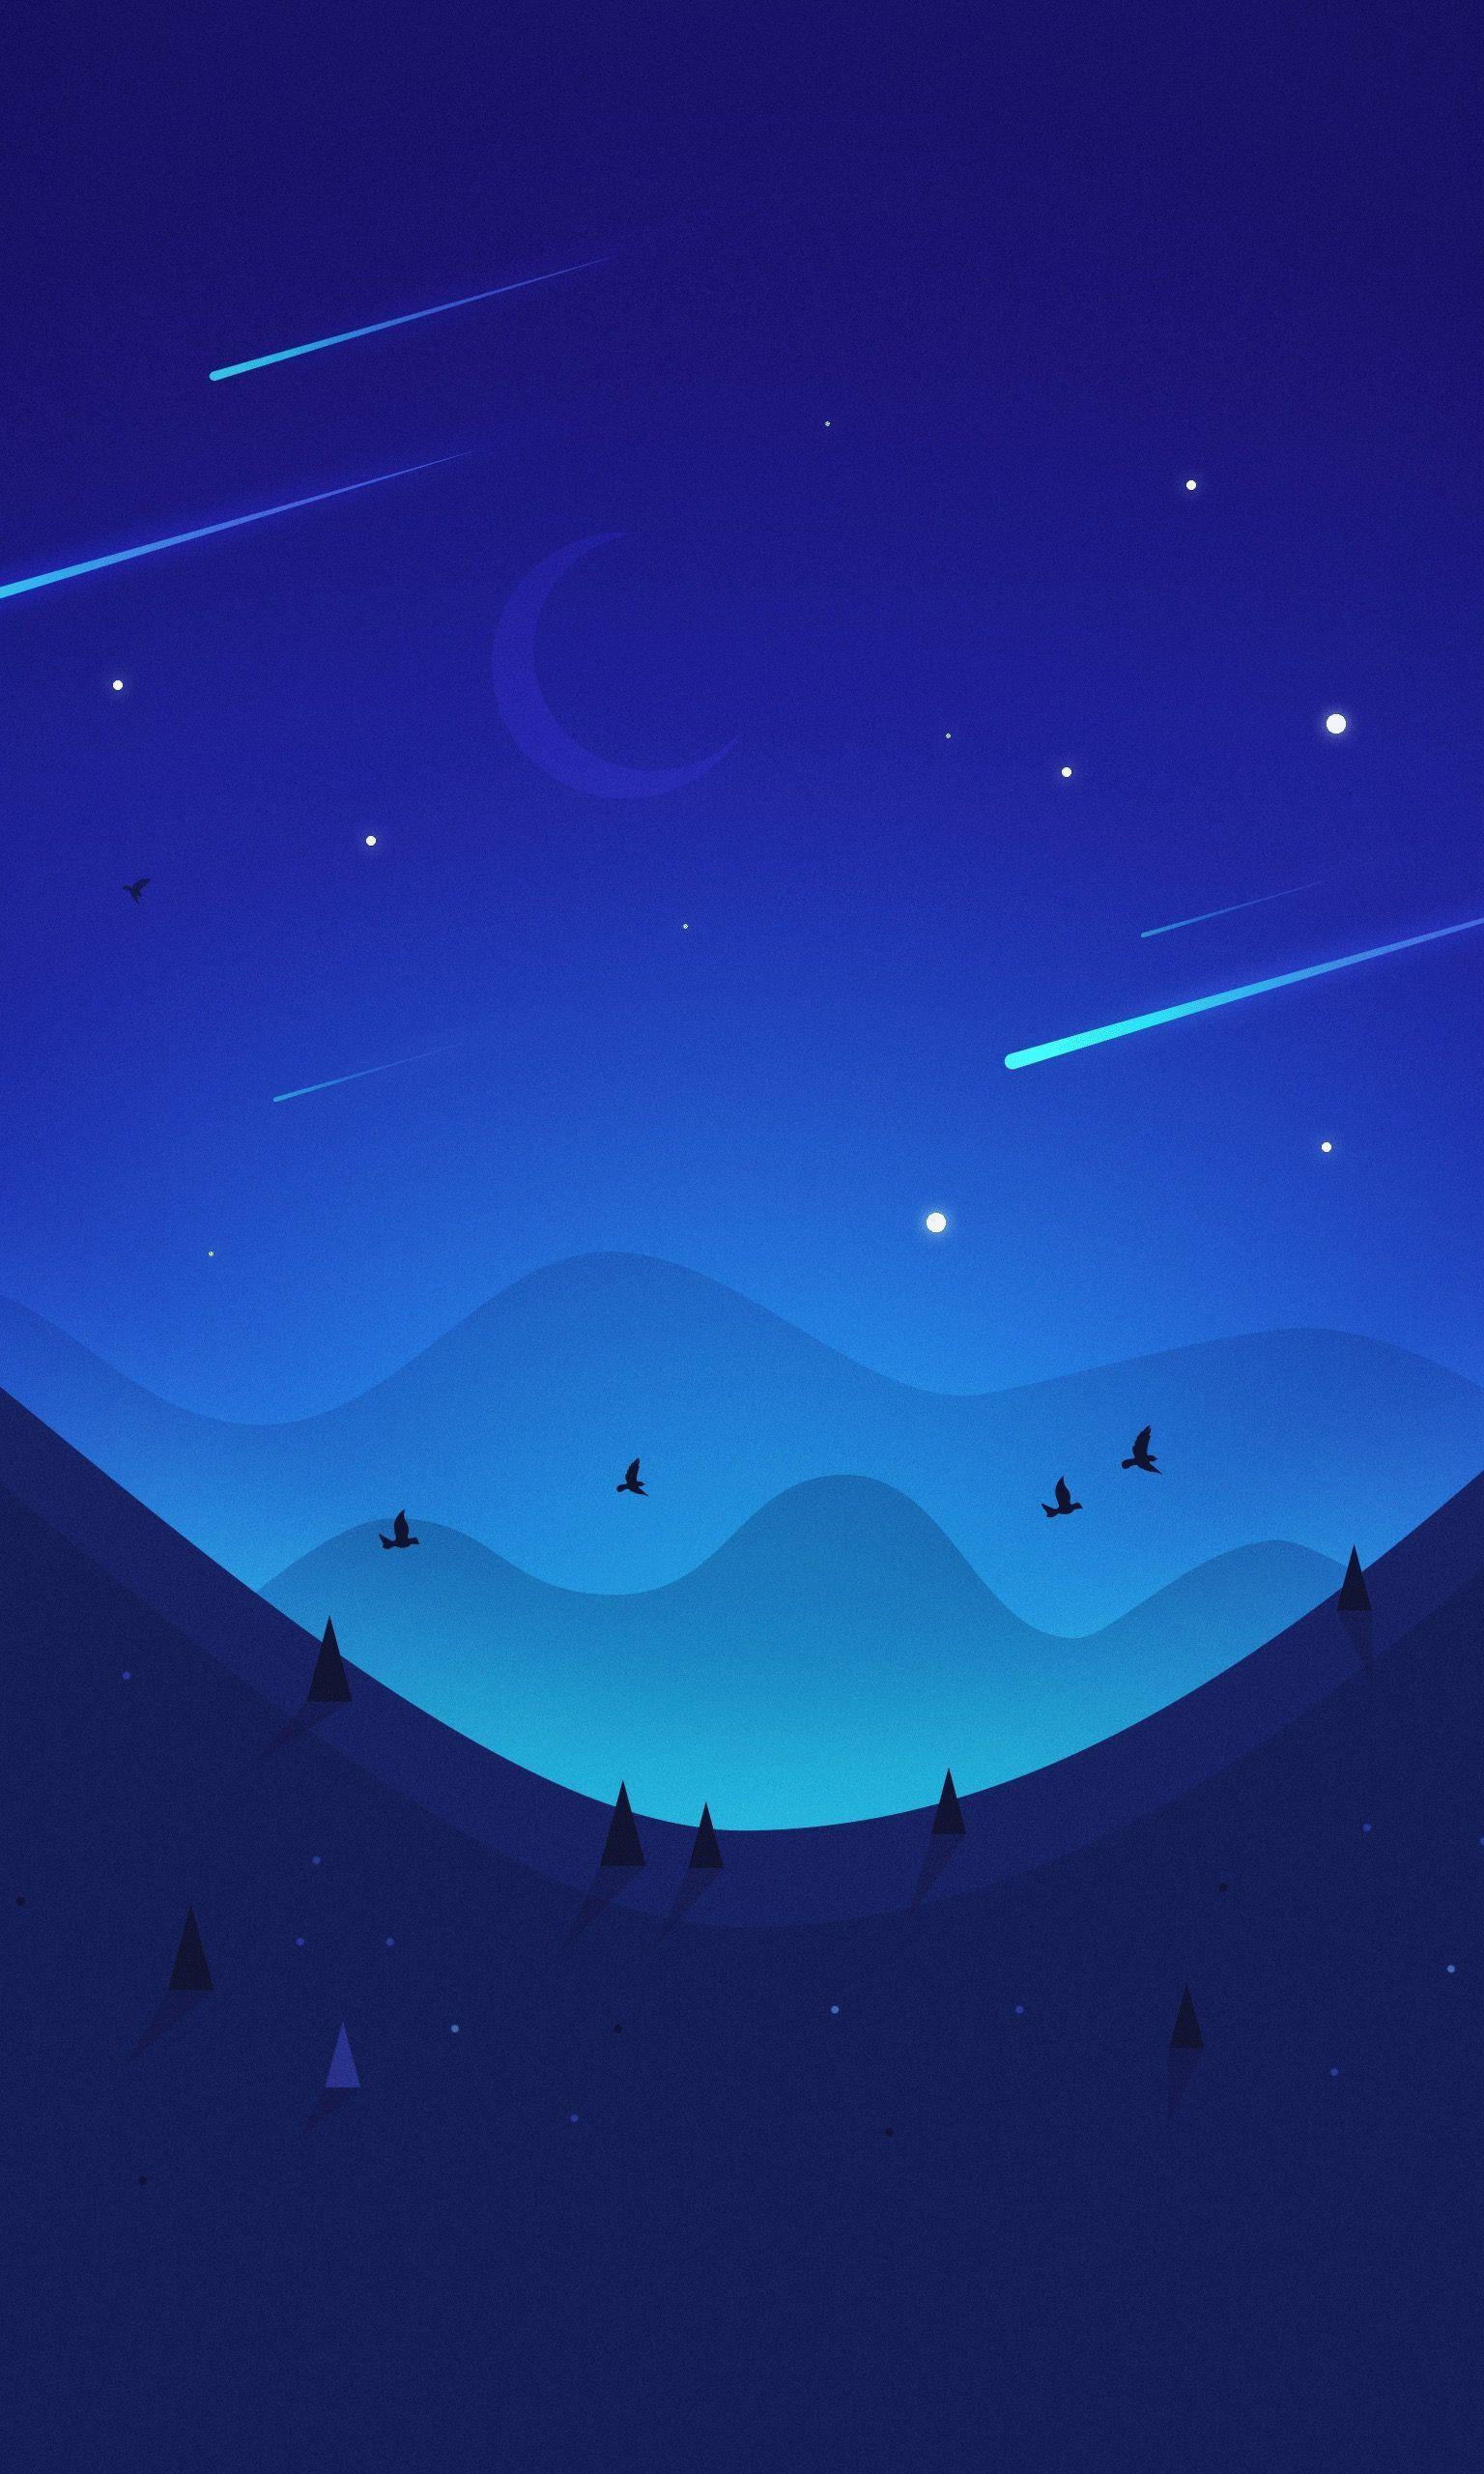 Картинка: Ночь, небо, звёзды, месяц, горы, птицы